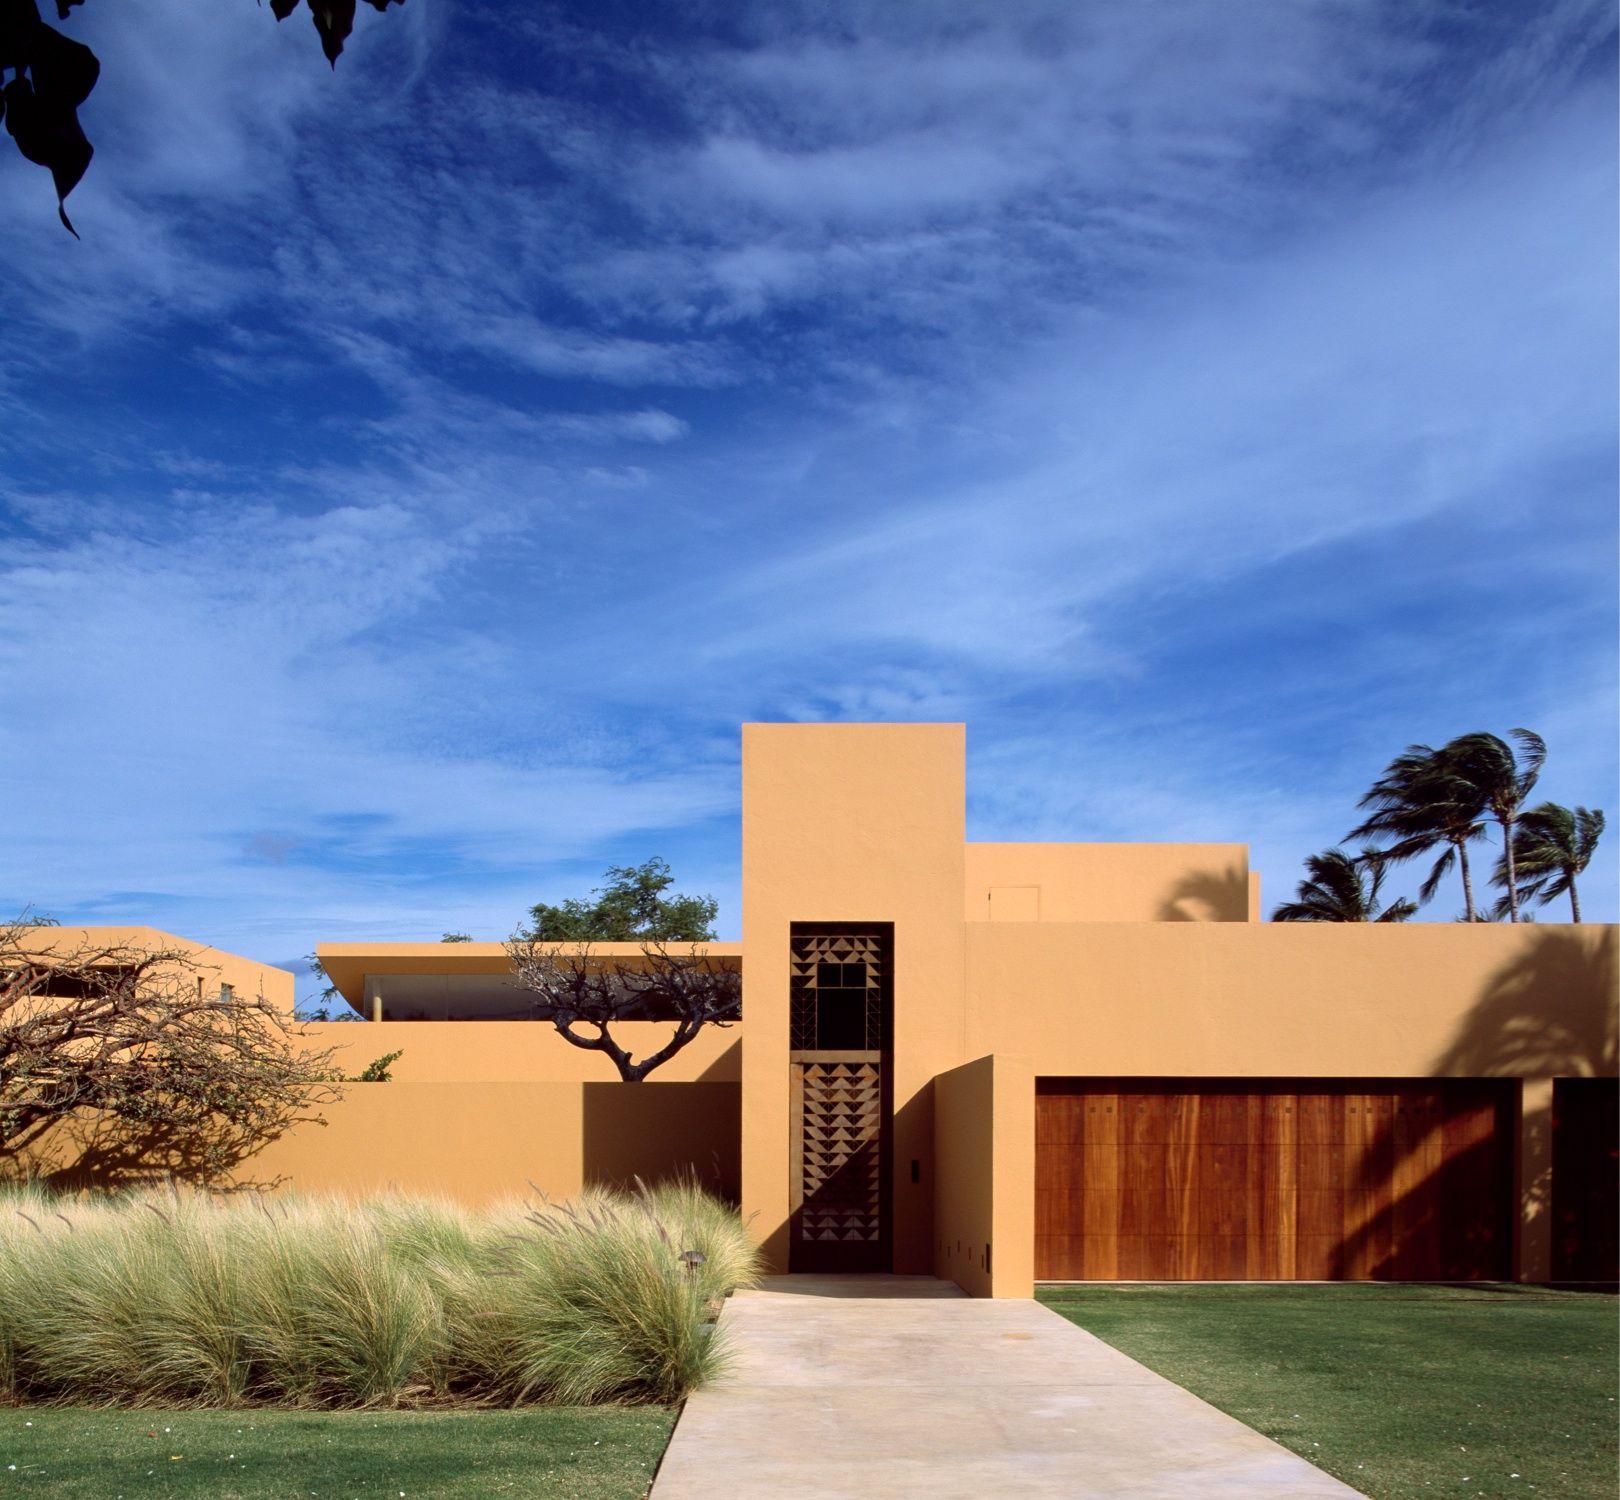 Kona House, Legorreta + Legorreta   arq_Residencial   Pinterest ...